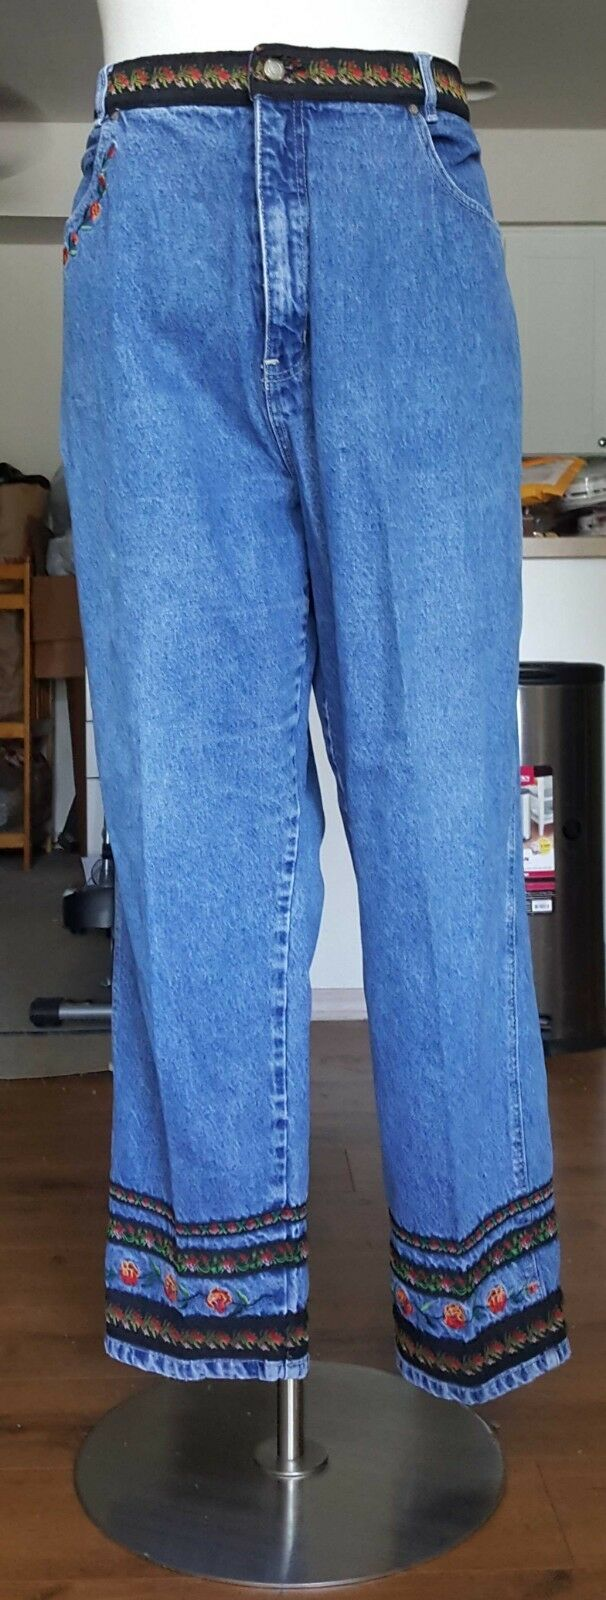 Bill Blass Women  Embroidered bluee denim jeans size 22W